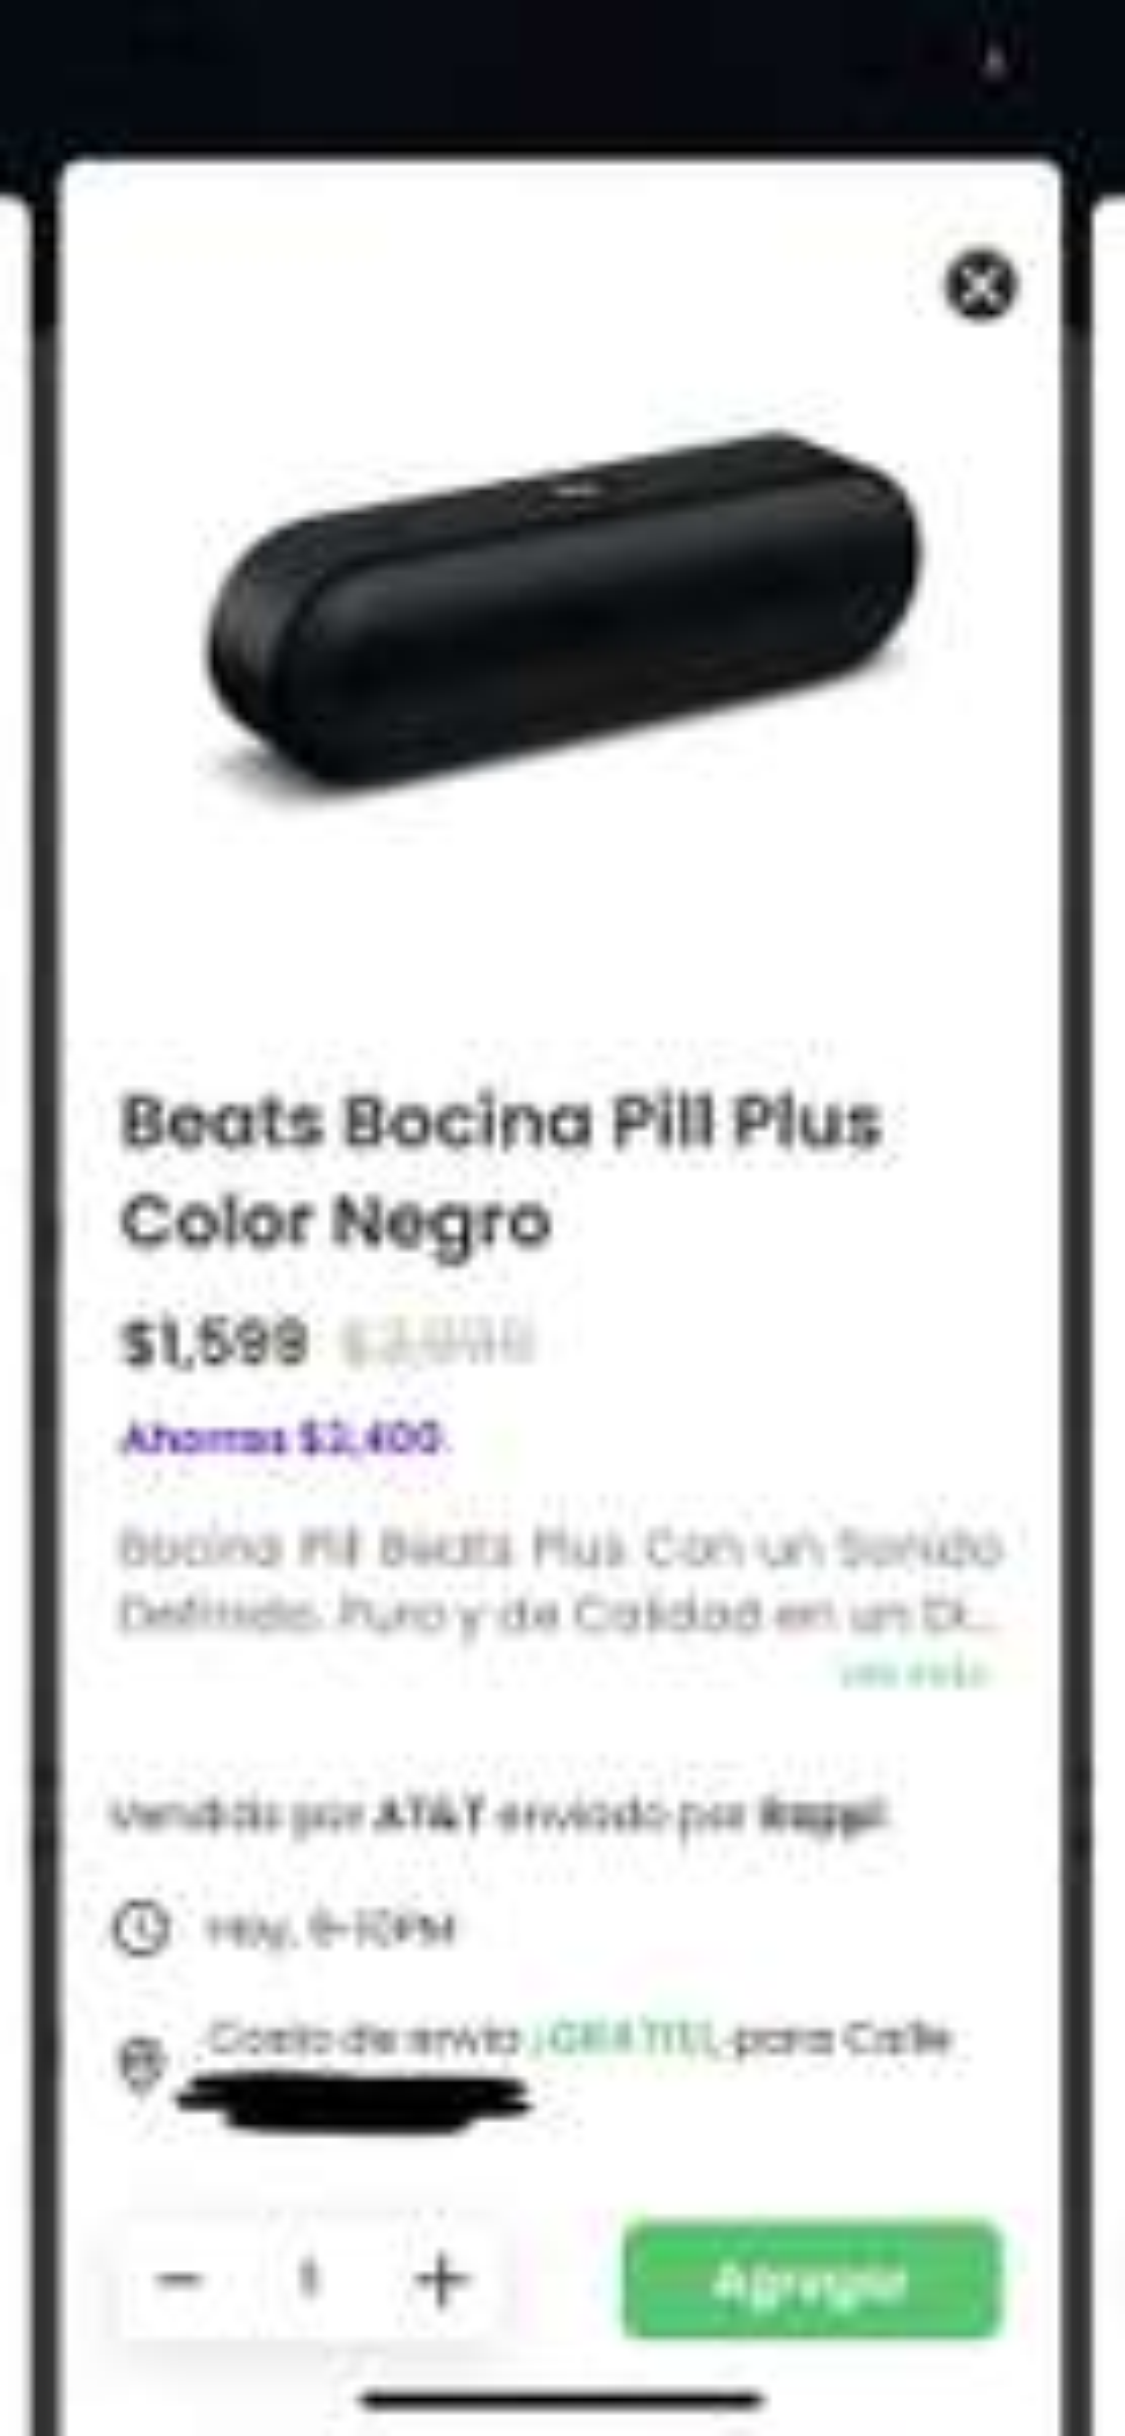 Rappi: Bocina Beats Pill+